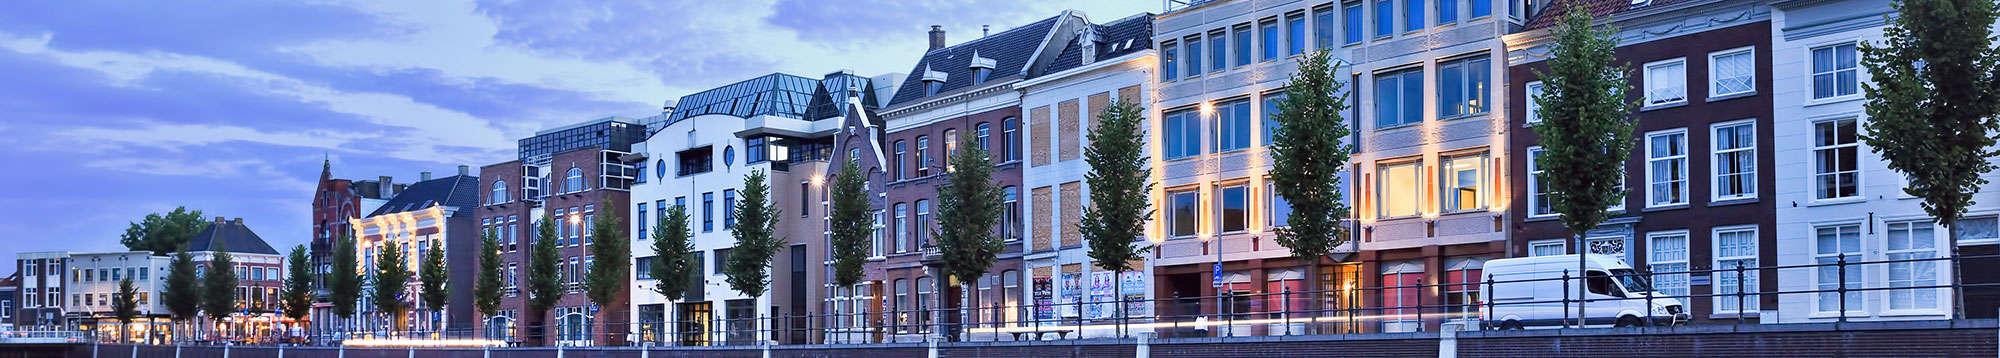 Week-end et séjour Breda